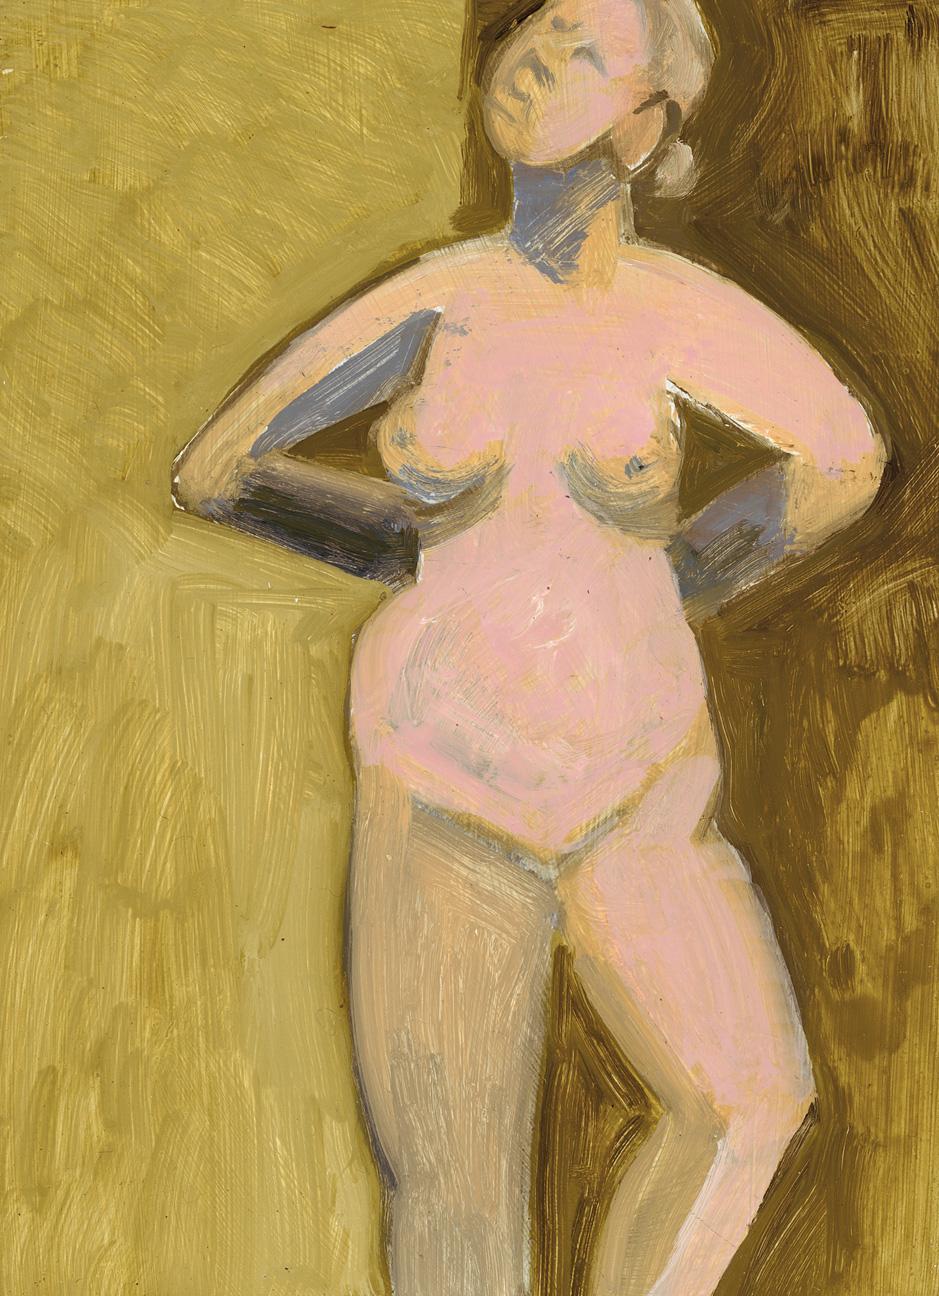 Standing Nude, Hands Behind Back